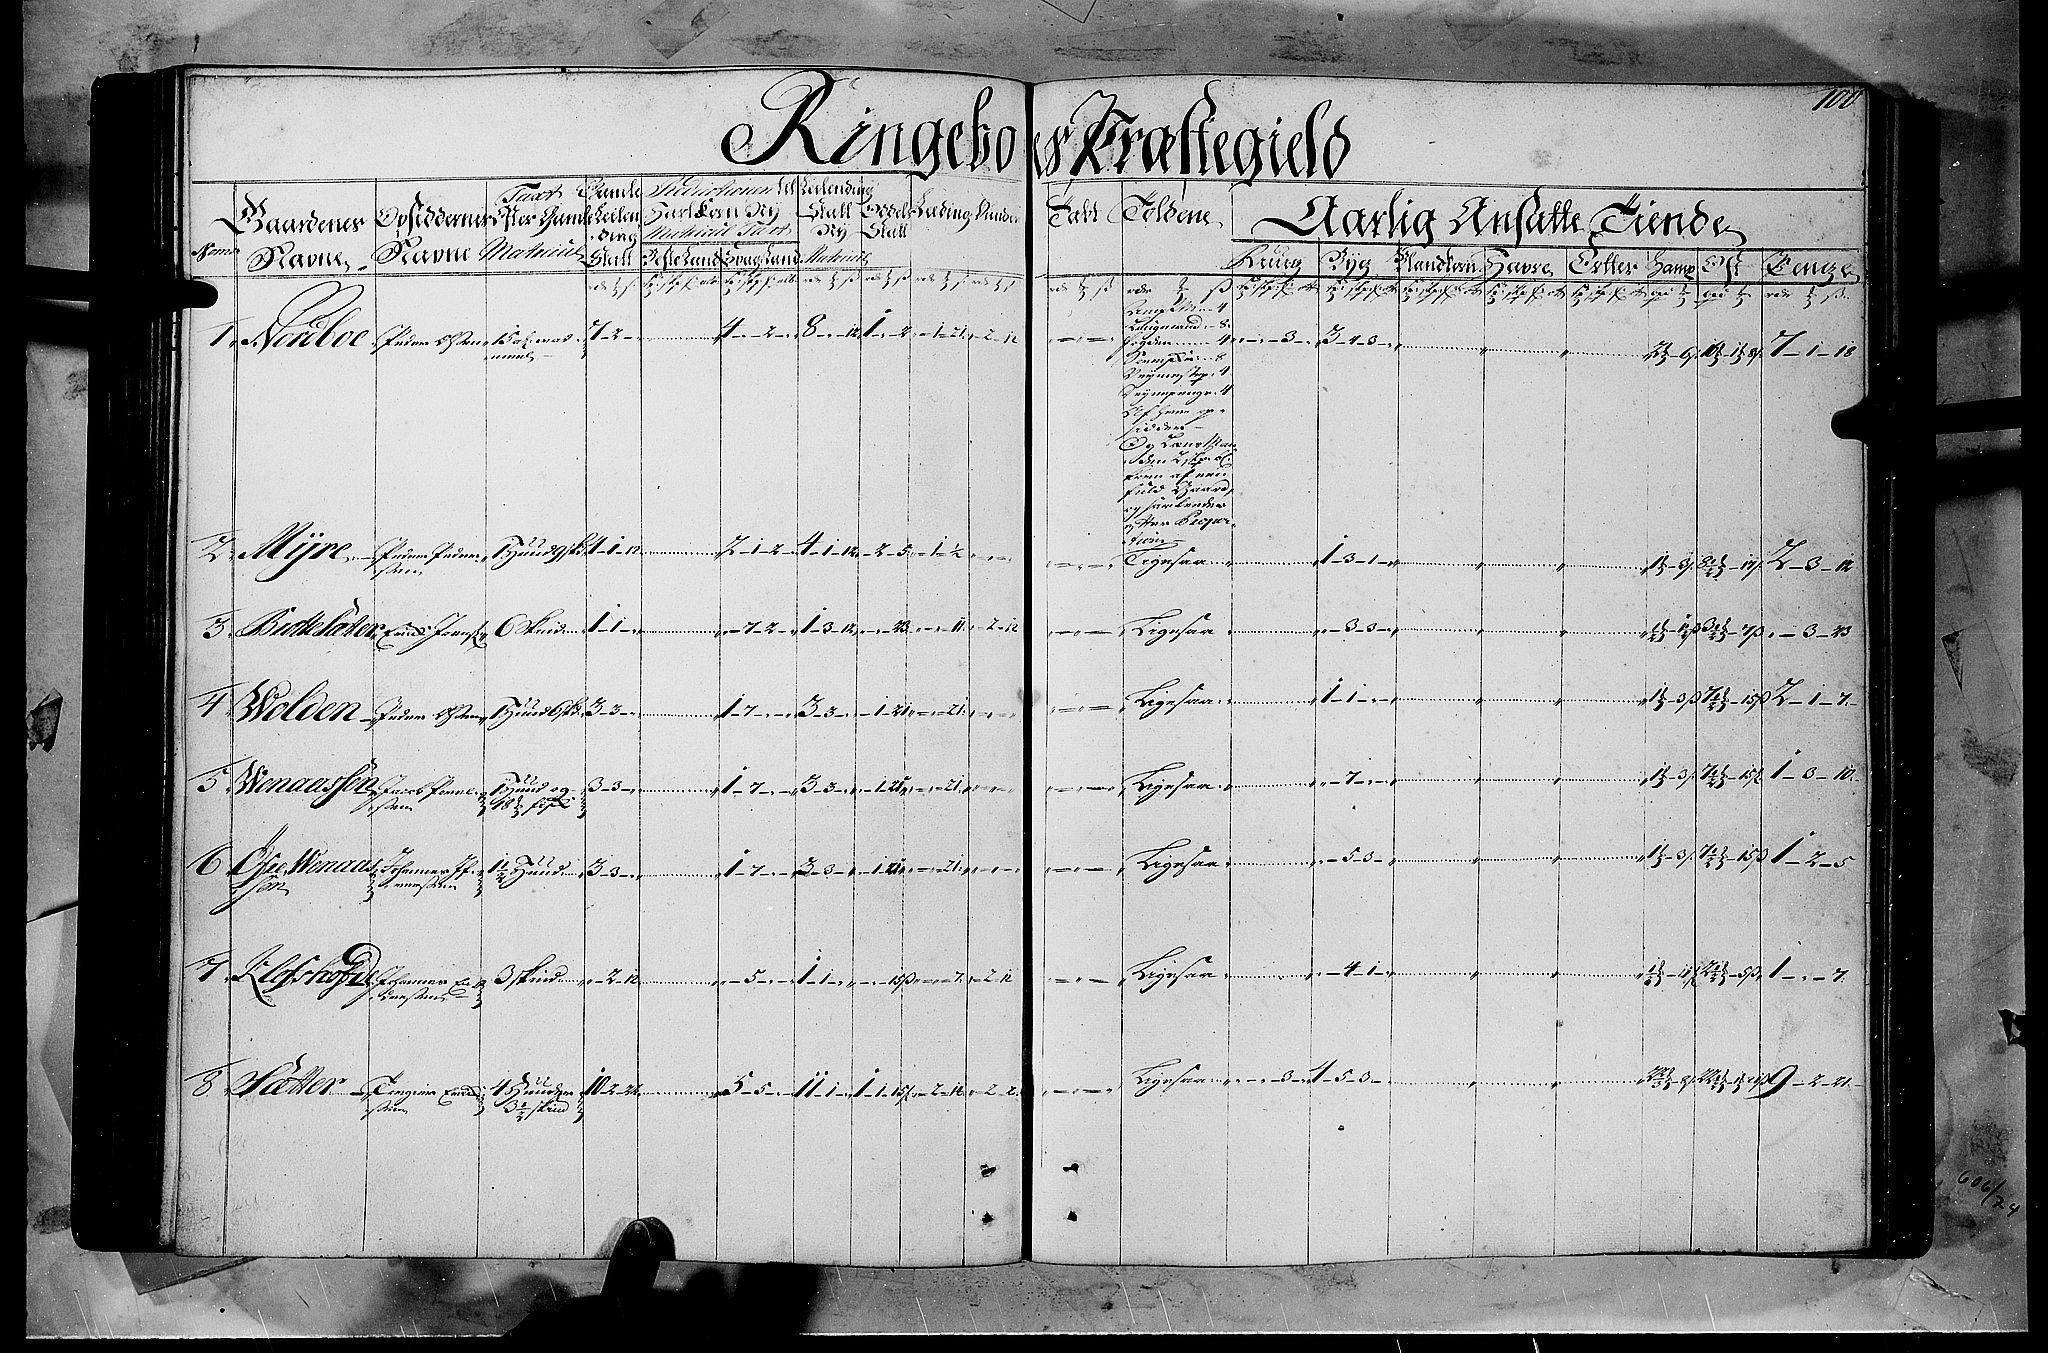 RA, Rentekammeret inntil 1814, Realistisk ordnet avdeling, N/Nb/Nbf/L0108: Gudbrandsdalen matrikkelprotokoll, 1723, s. 99b-100a